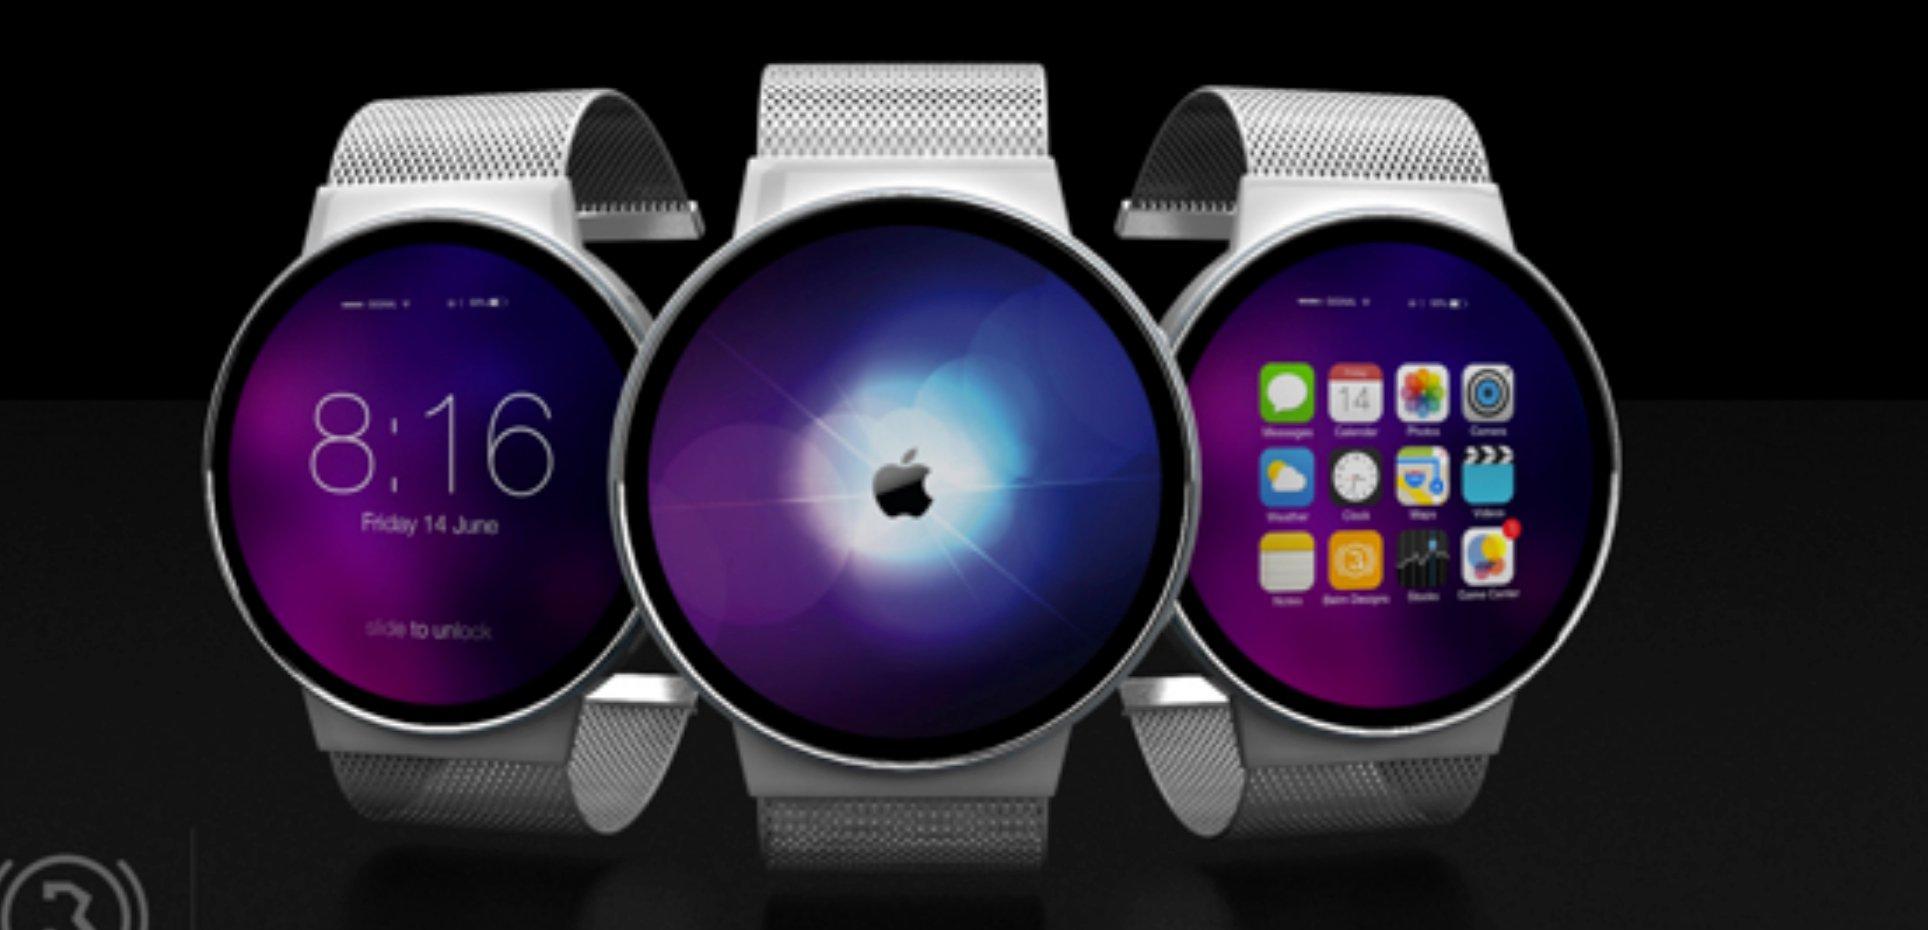 iwatch news preis release termin der apple smartwatch. Black Bedroom Furniture Sets. Home Design Ideas